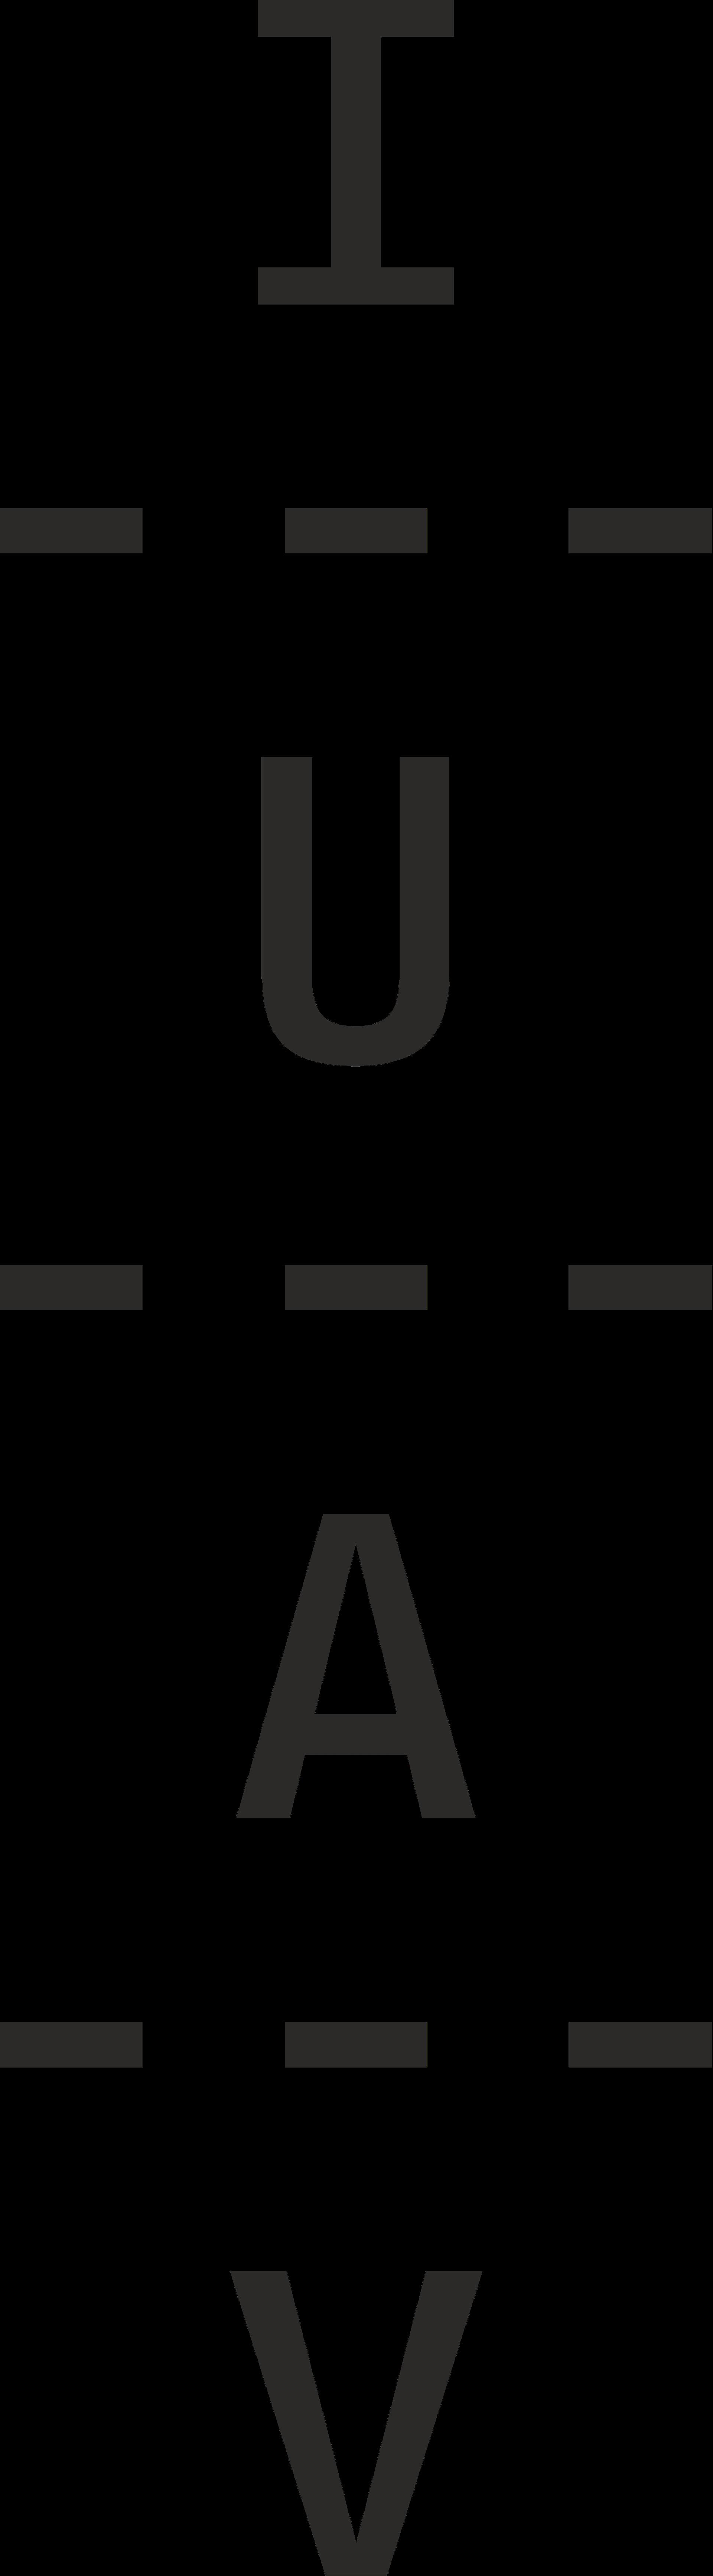 Logo 1500923790.png?ixlib=rb 1.1